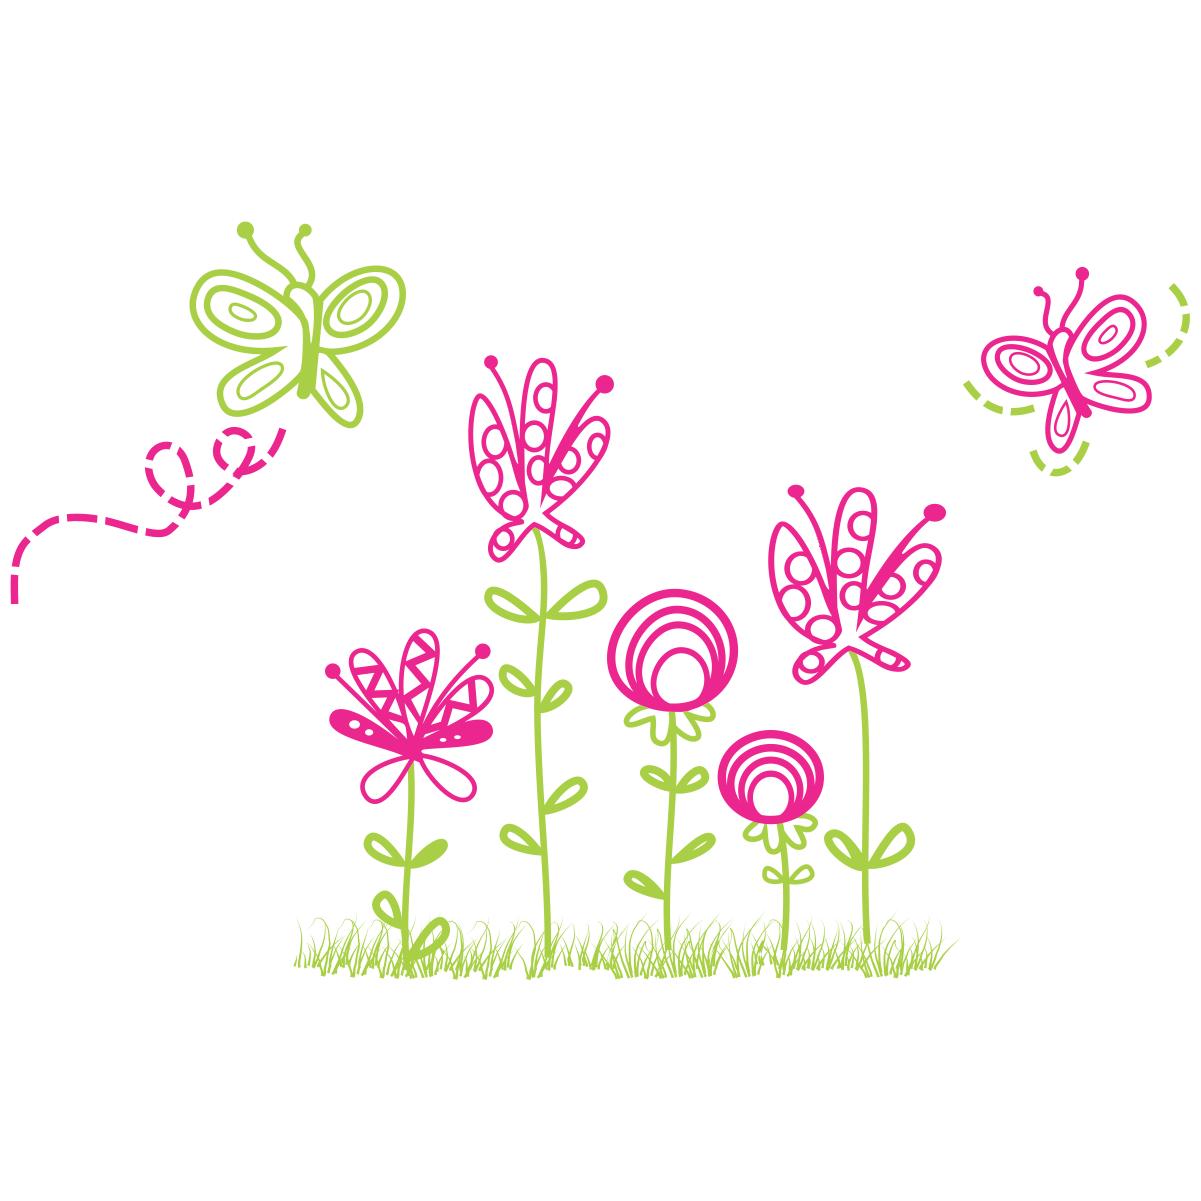 imagens de livros de literatura infantil para colorir